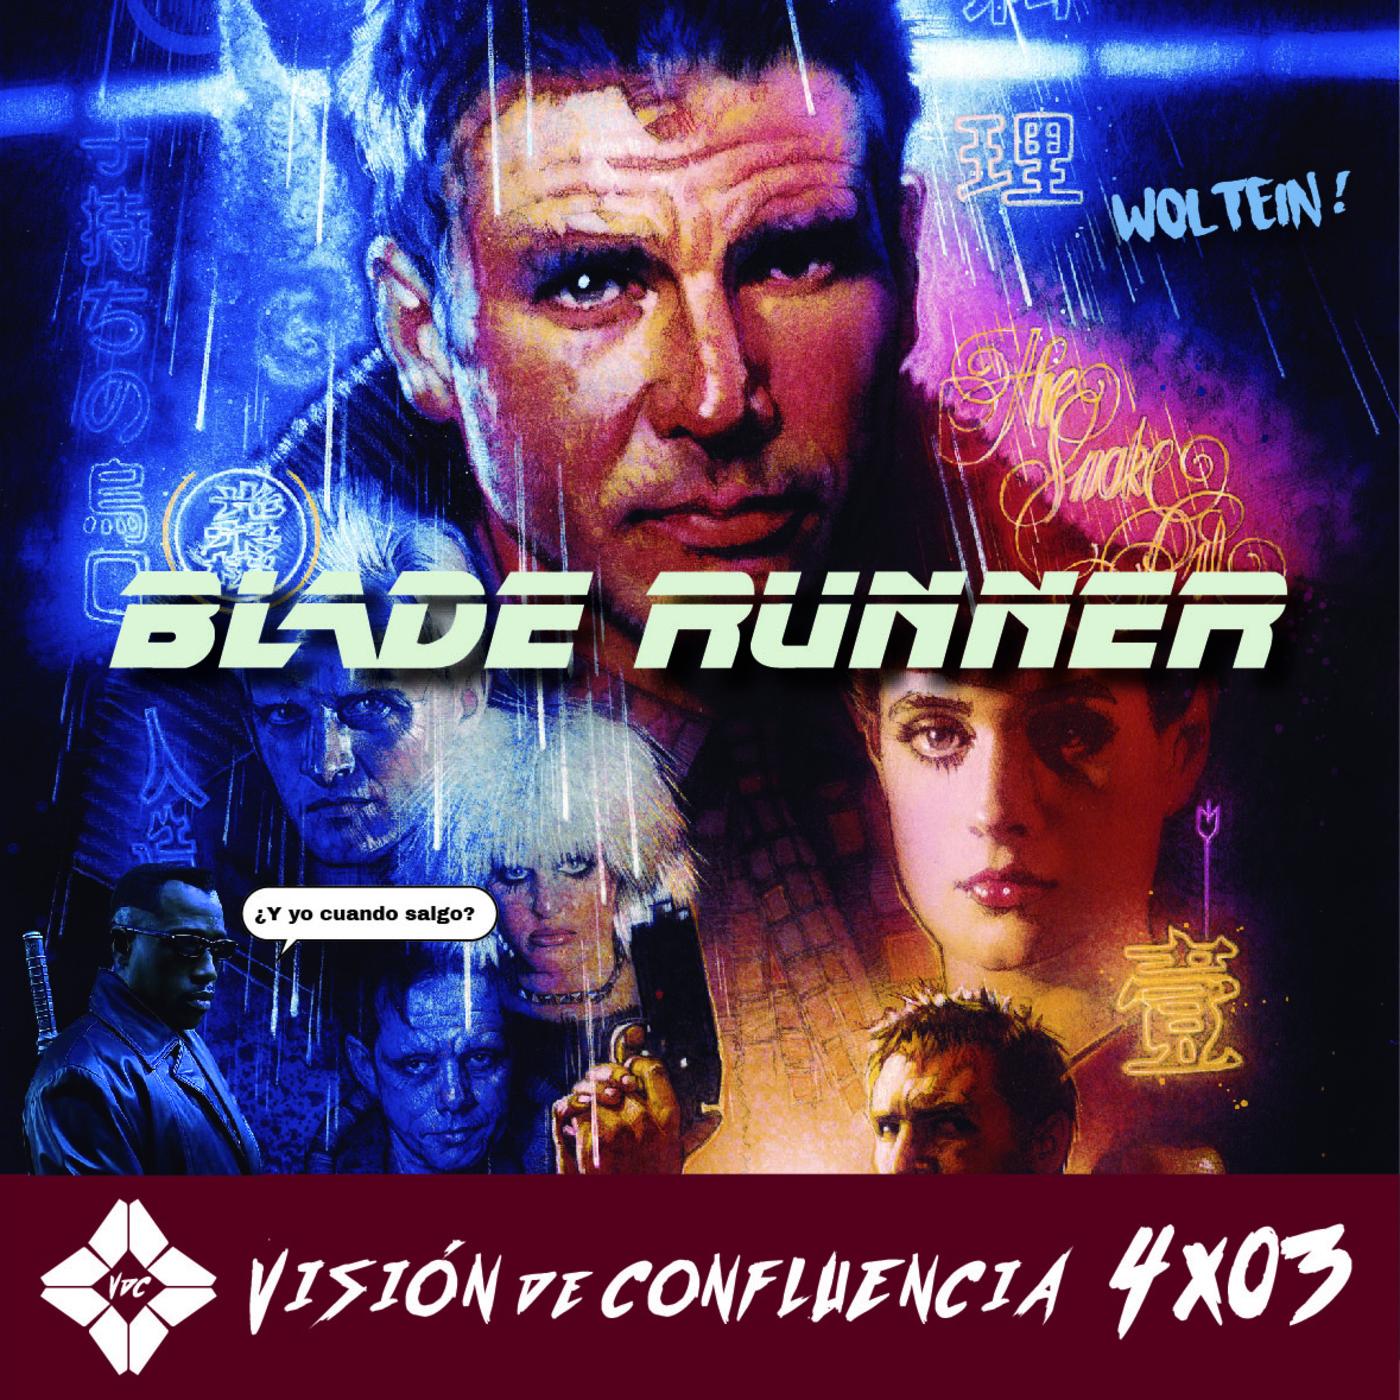 4x03 Blade Runner